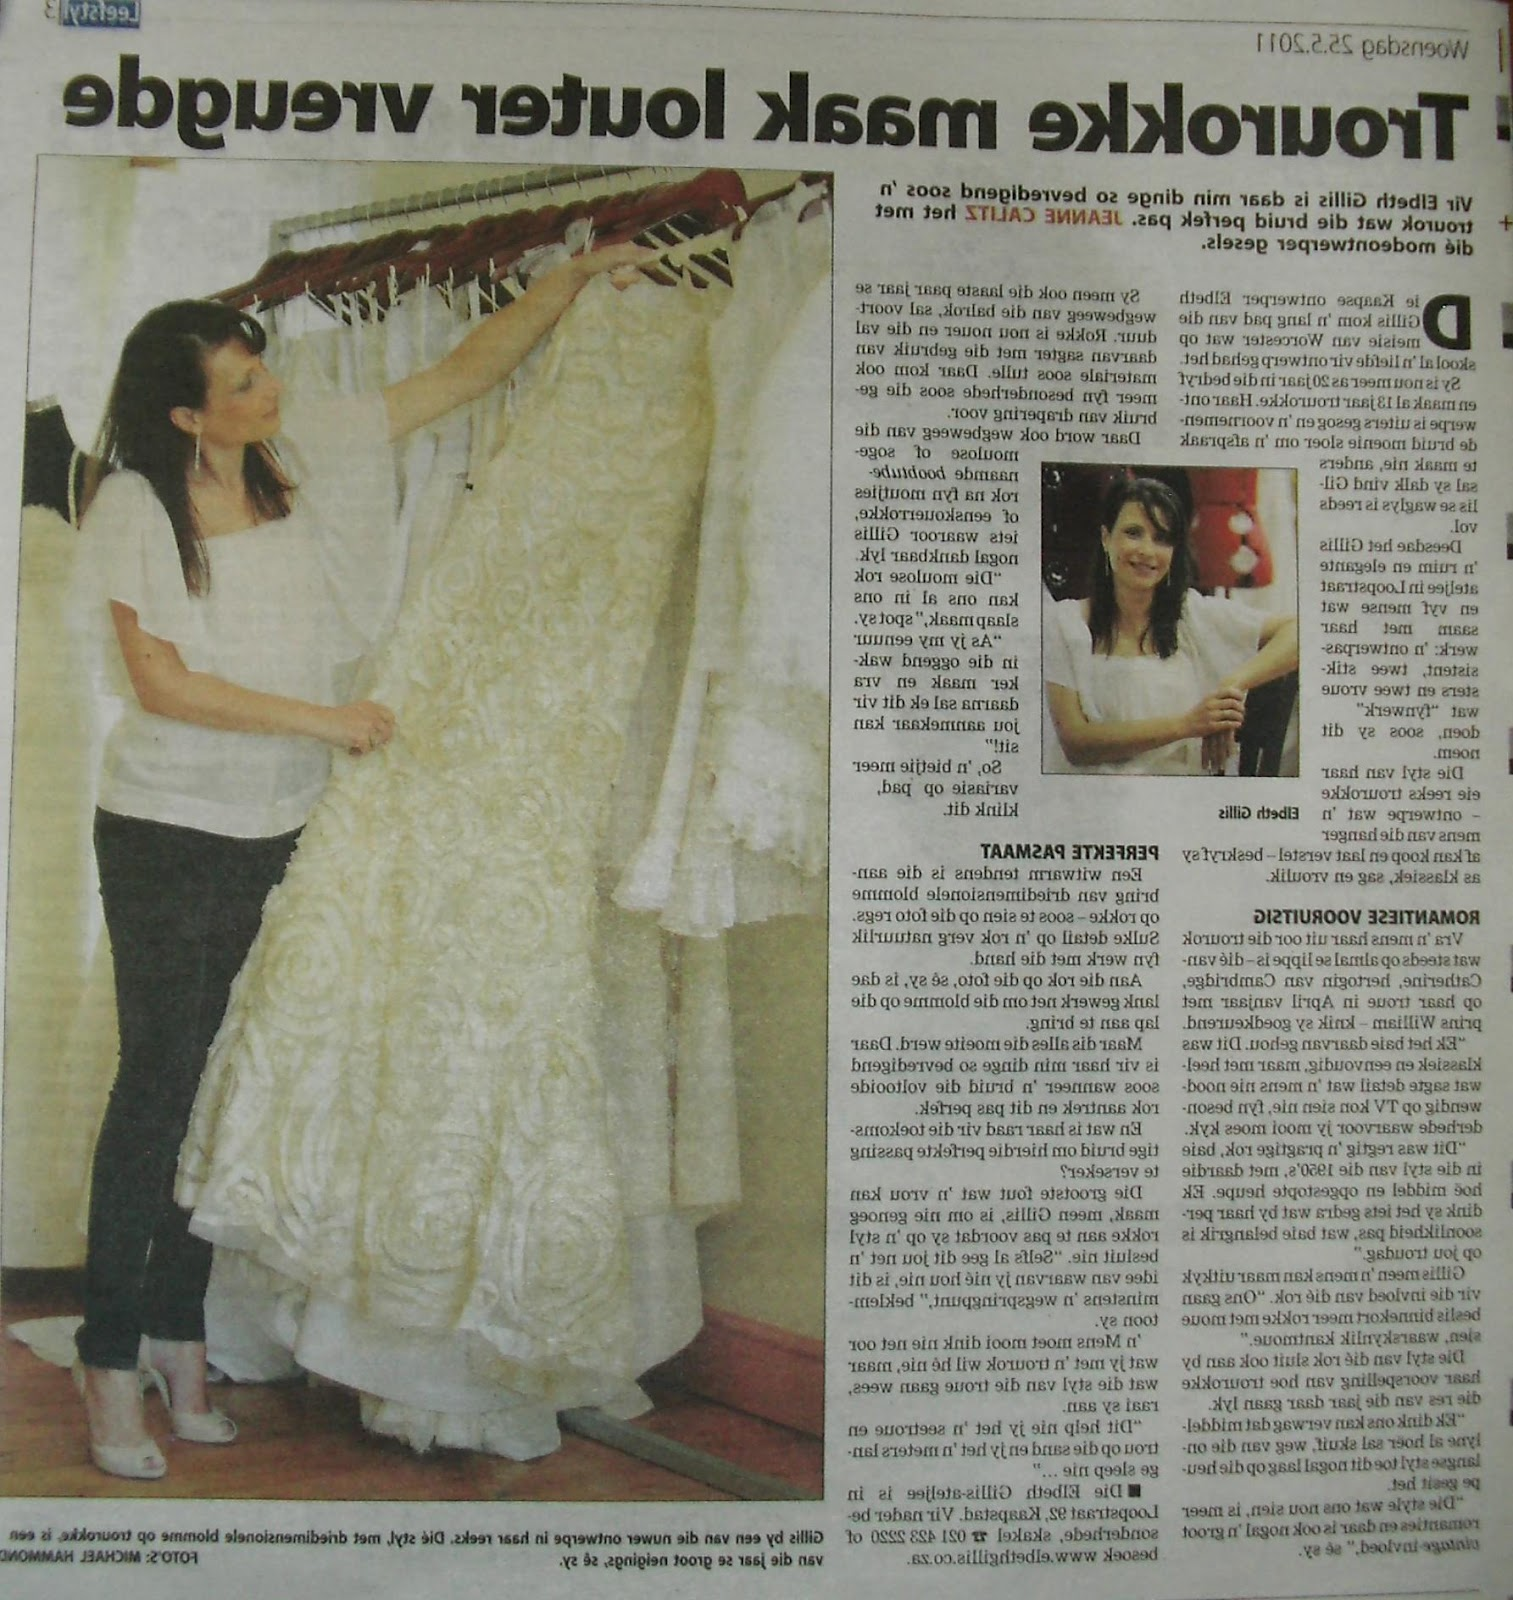 The Royal Wedding Dress